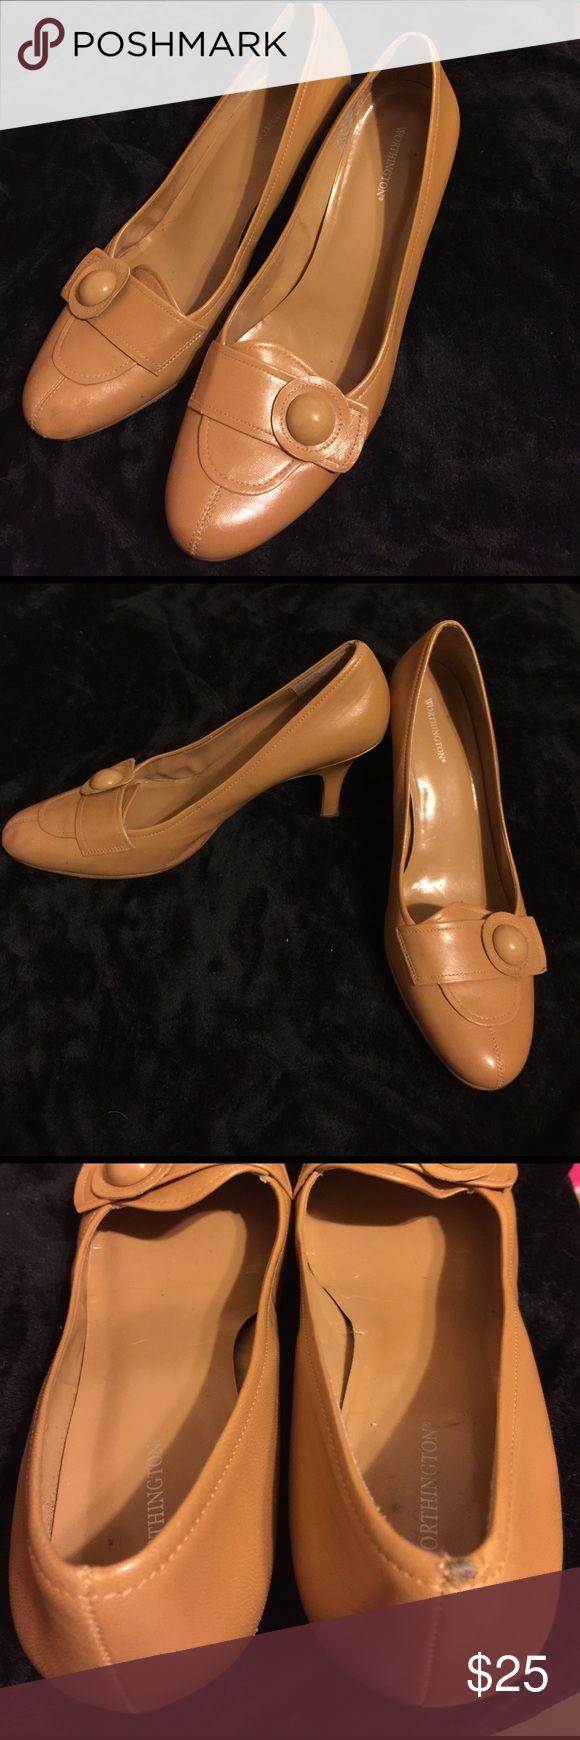 Worthington 10M beige tan high heels 👠 Worthington 10M beige tan high heels 👠 hardly ever used. However, slight scuff see pictures. Worthington Shoes Heels